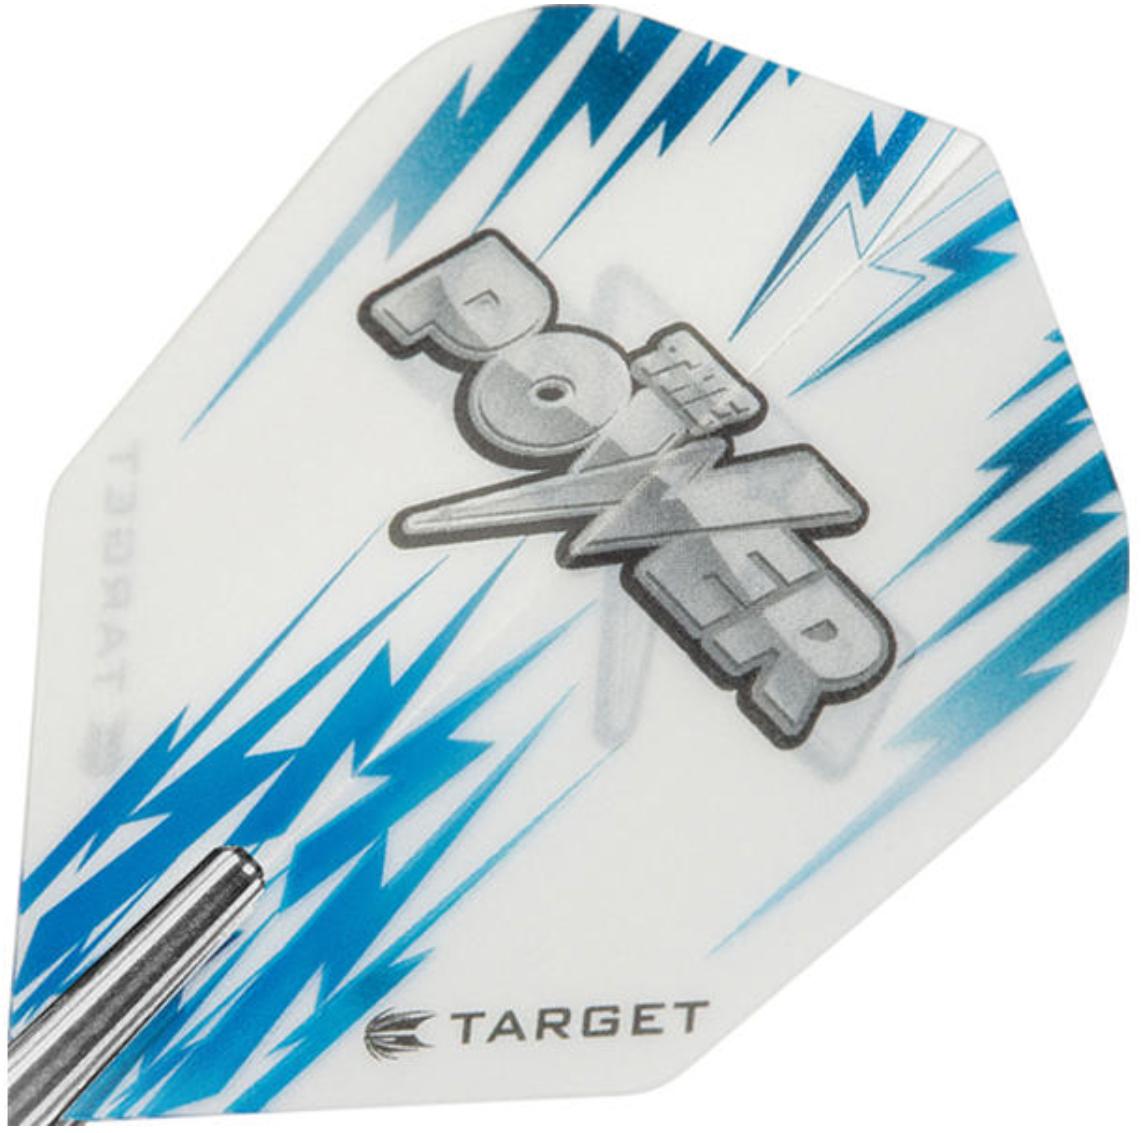 Target Phil Taylor 9-Five Vision No.6